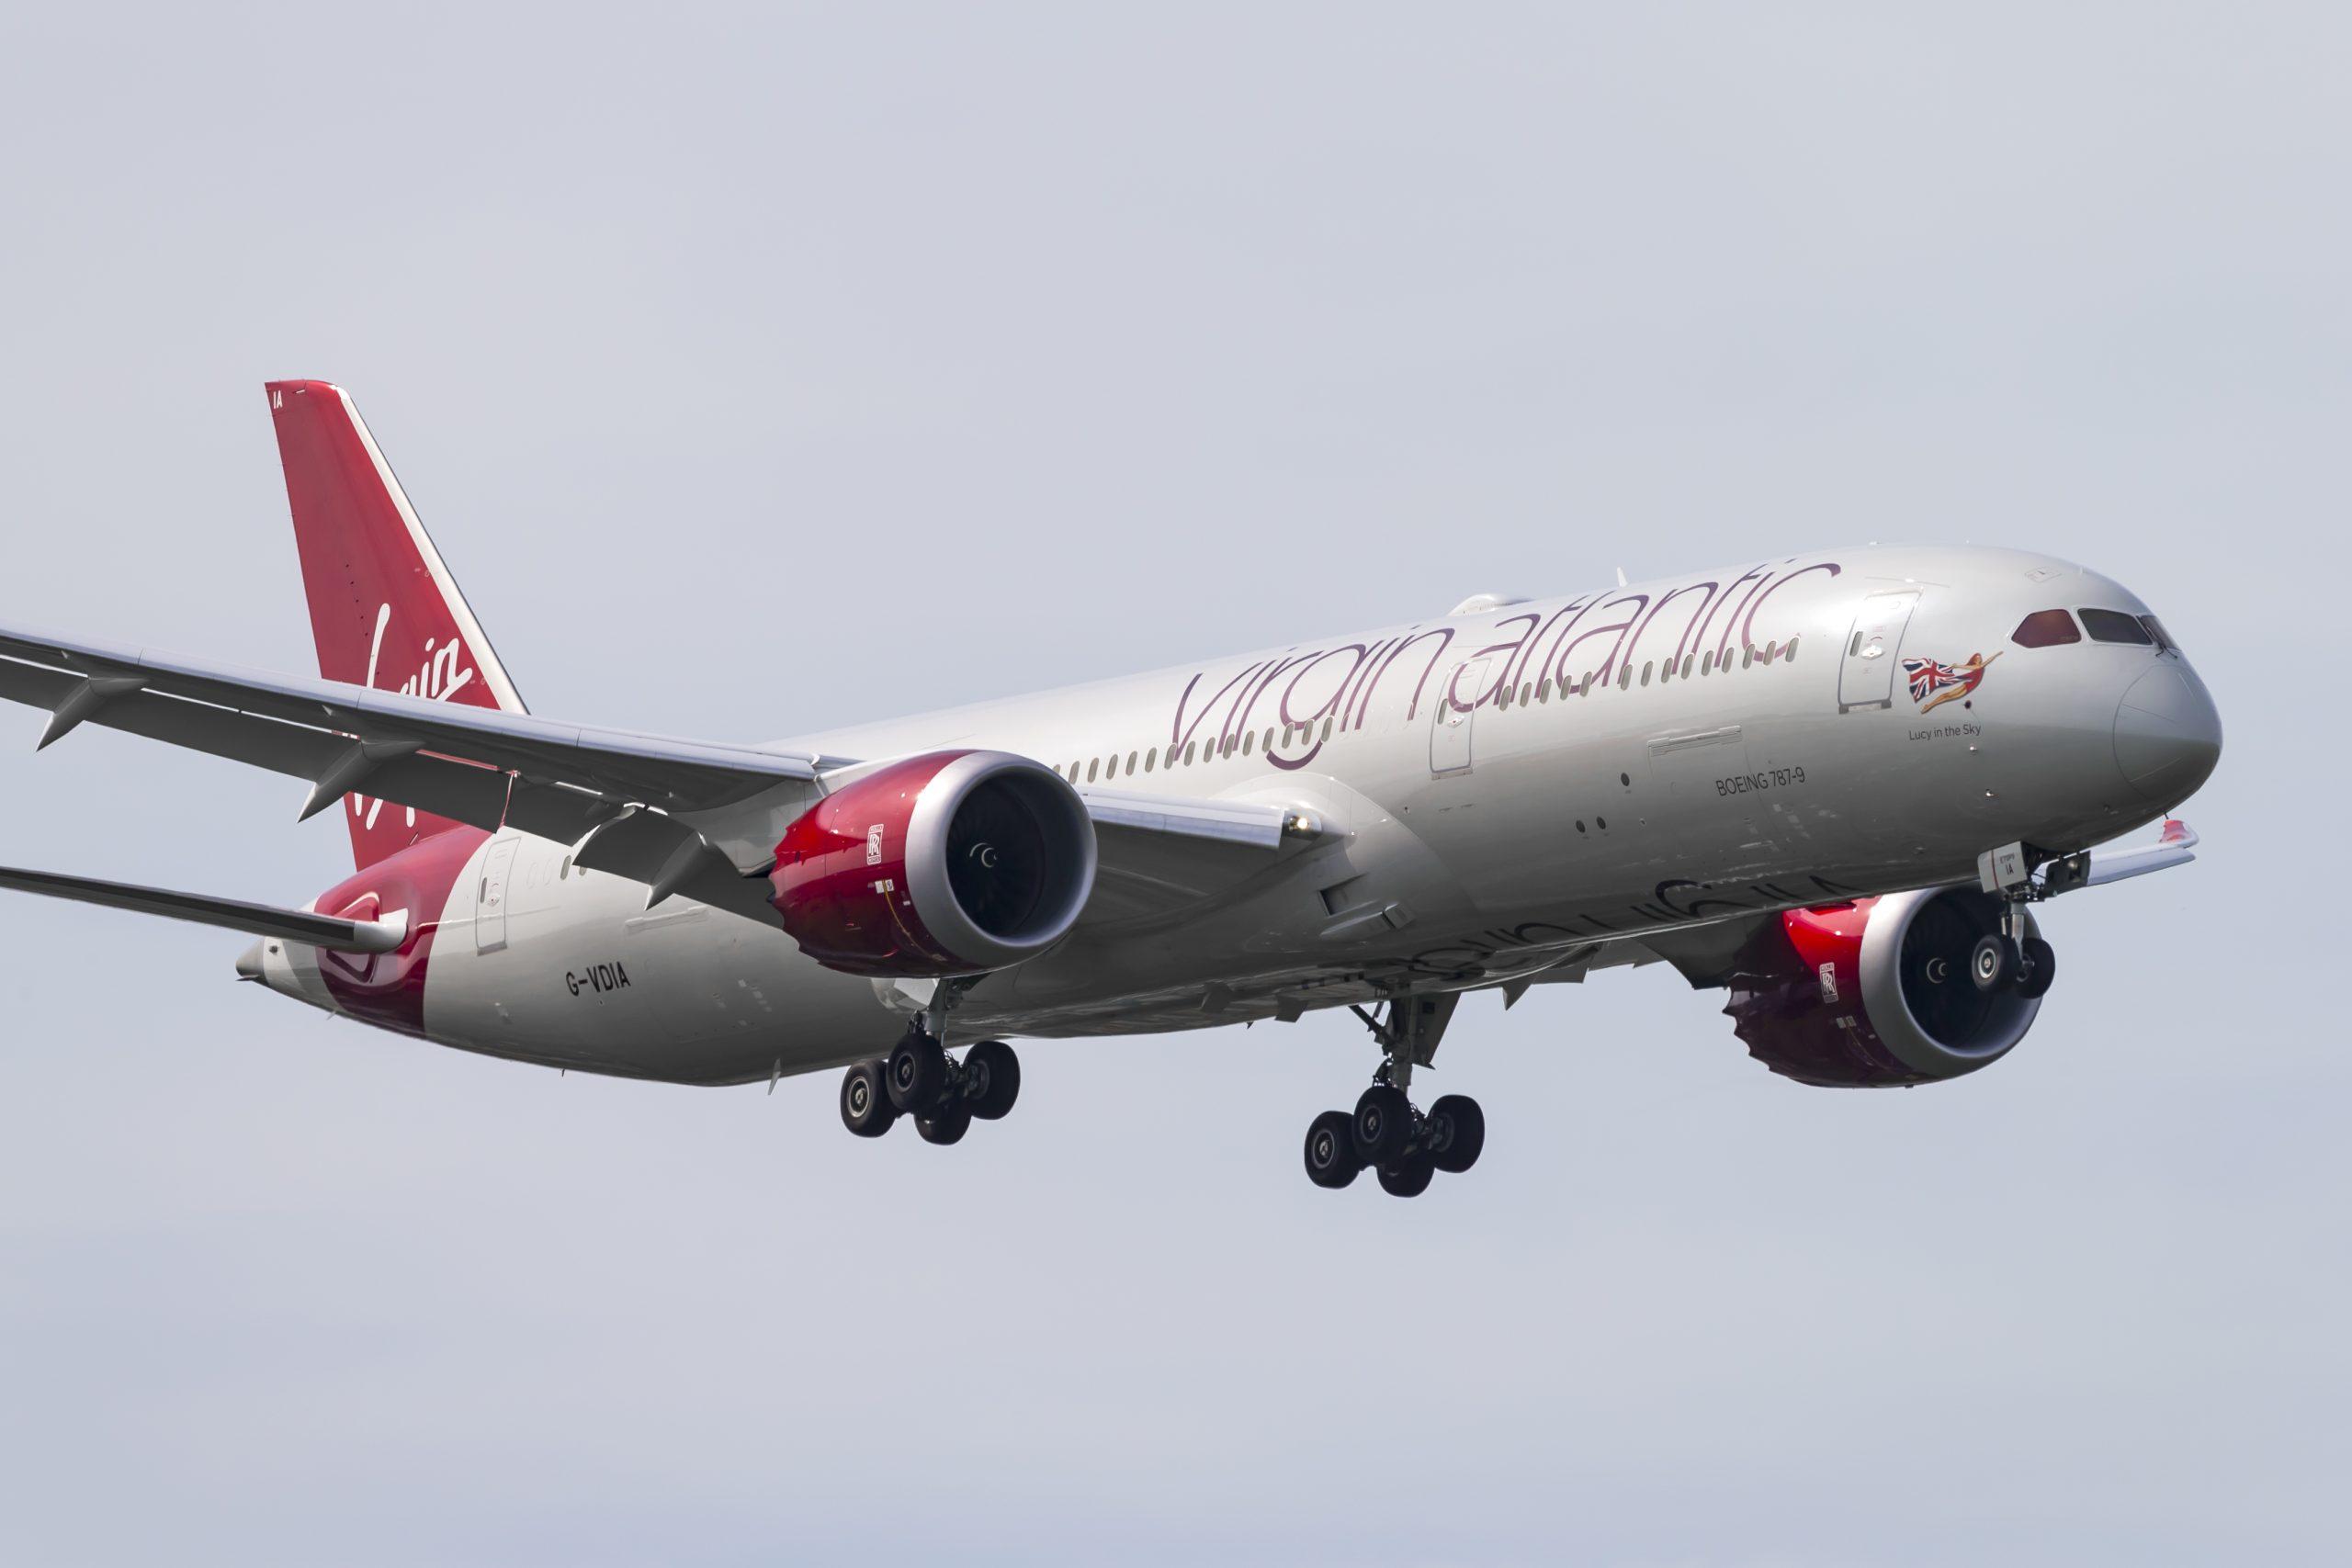 En Boeing 787-9 Dreamliner fra Virgin Atlantic. Foto: © Thorbjørn Brunander Sund, Danish Aviation Photo